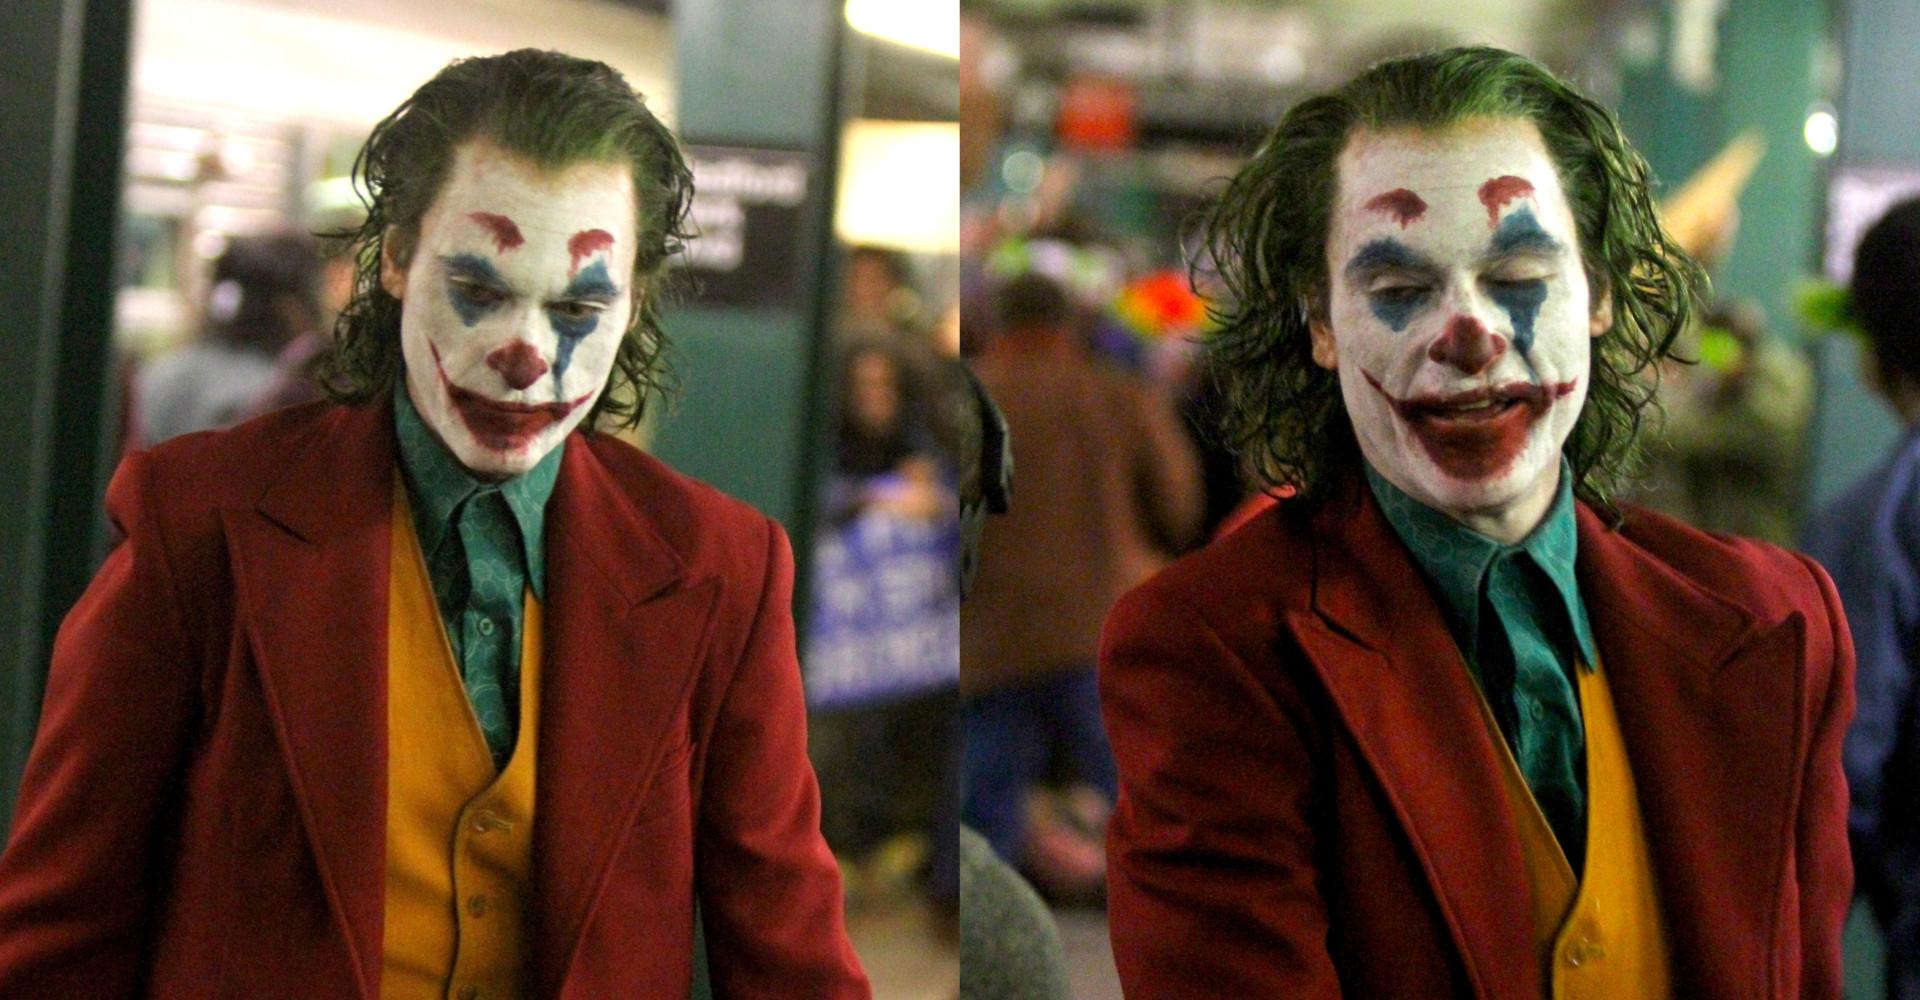 Joaquin Phoenix terrorizes NYC subway as the 'Joker'